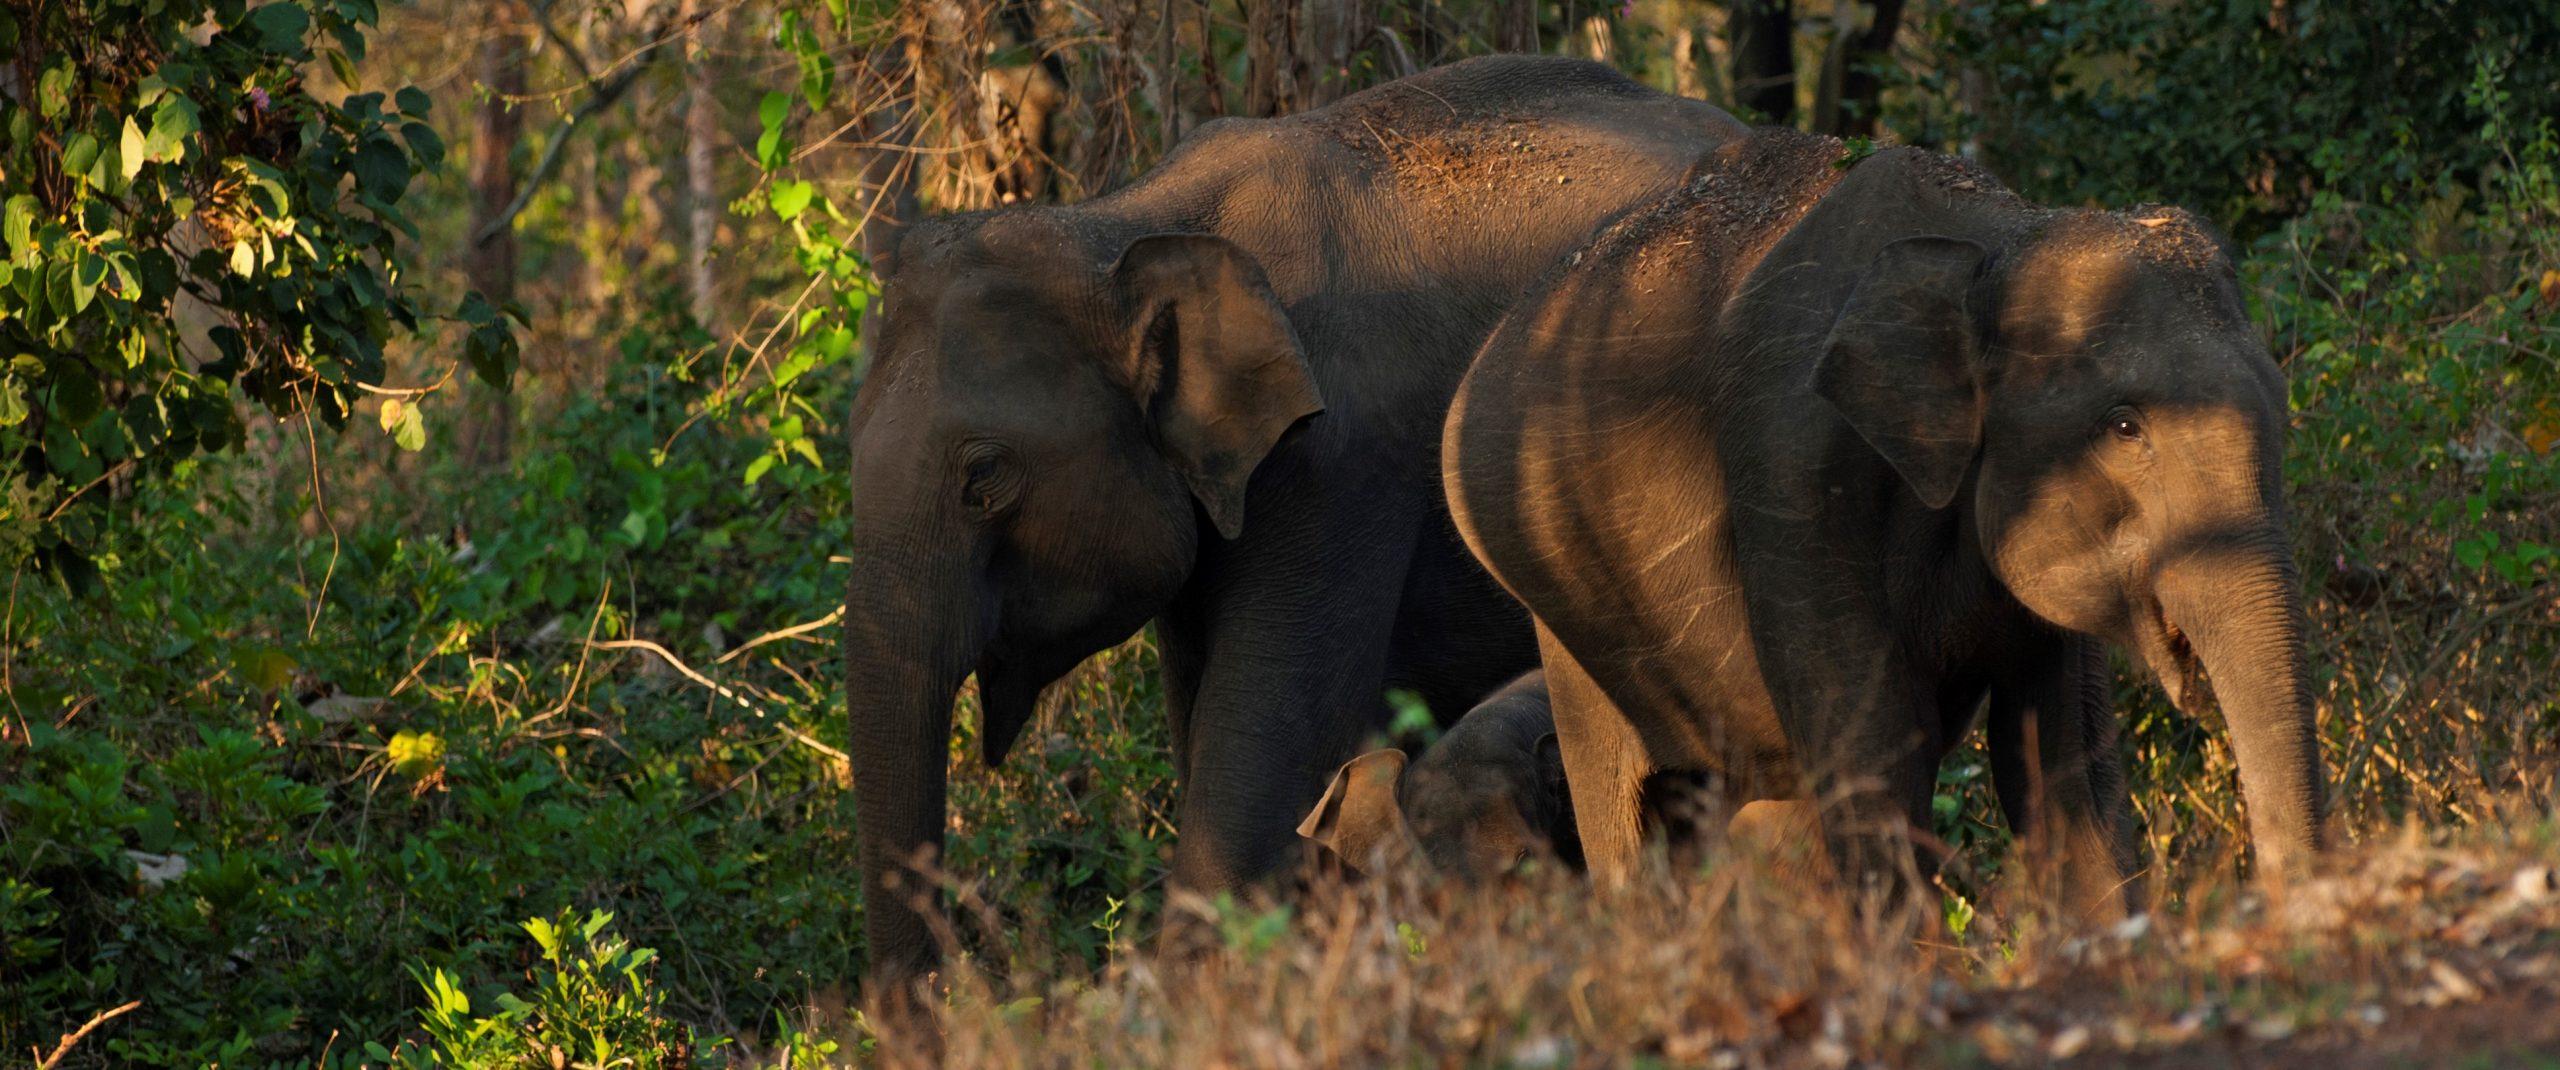 Anyone for fieldwork (with elephants)? By Sandy Harrison